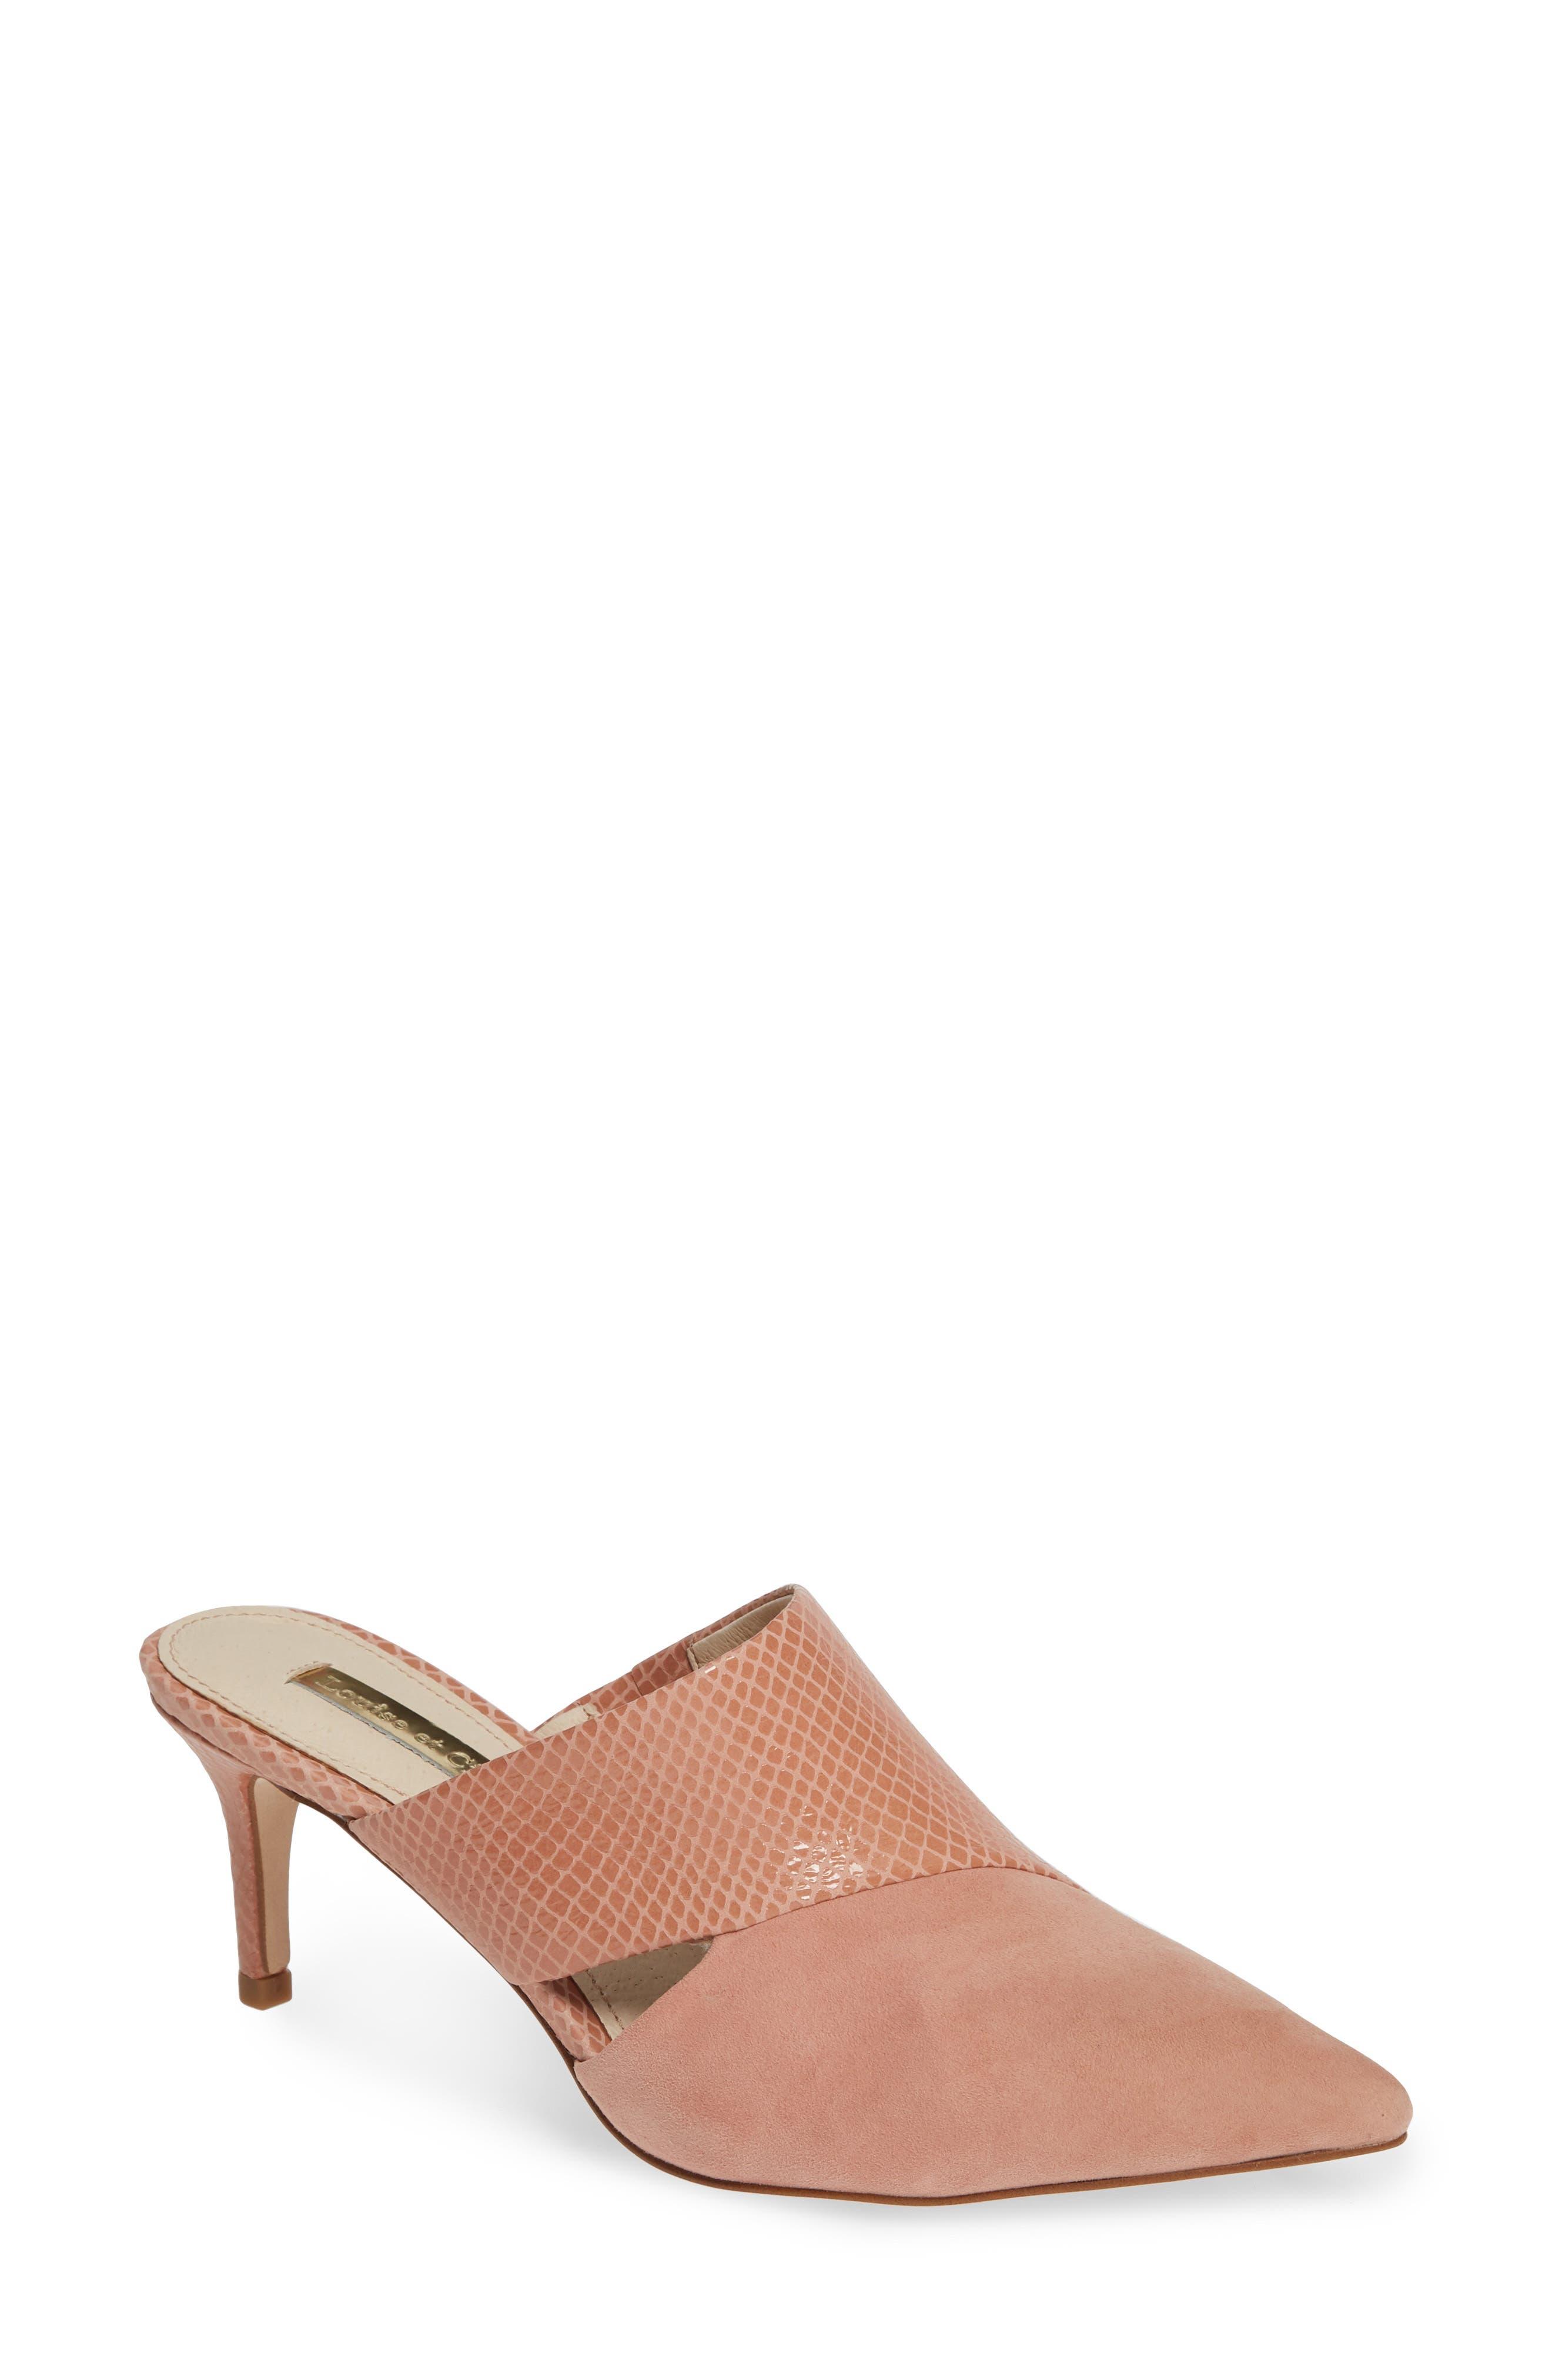 Louise Et Cie Jelisa Pointy Toe Mule, Pink